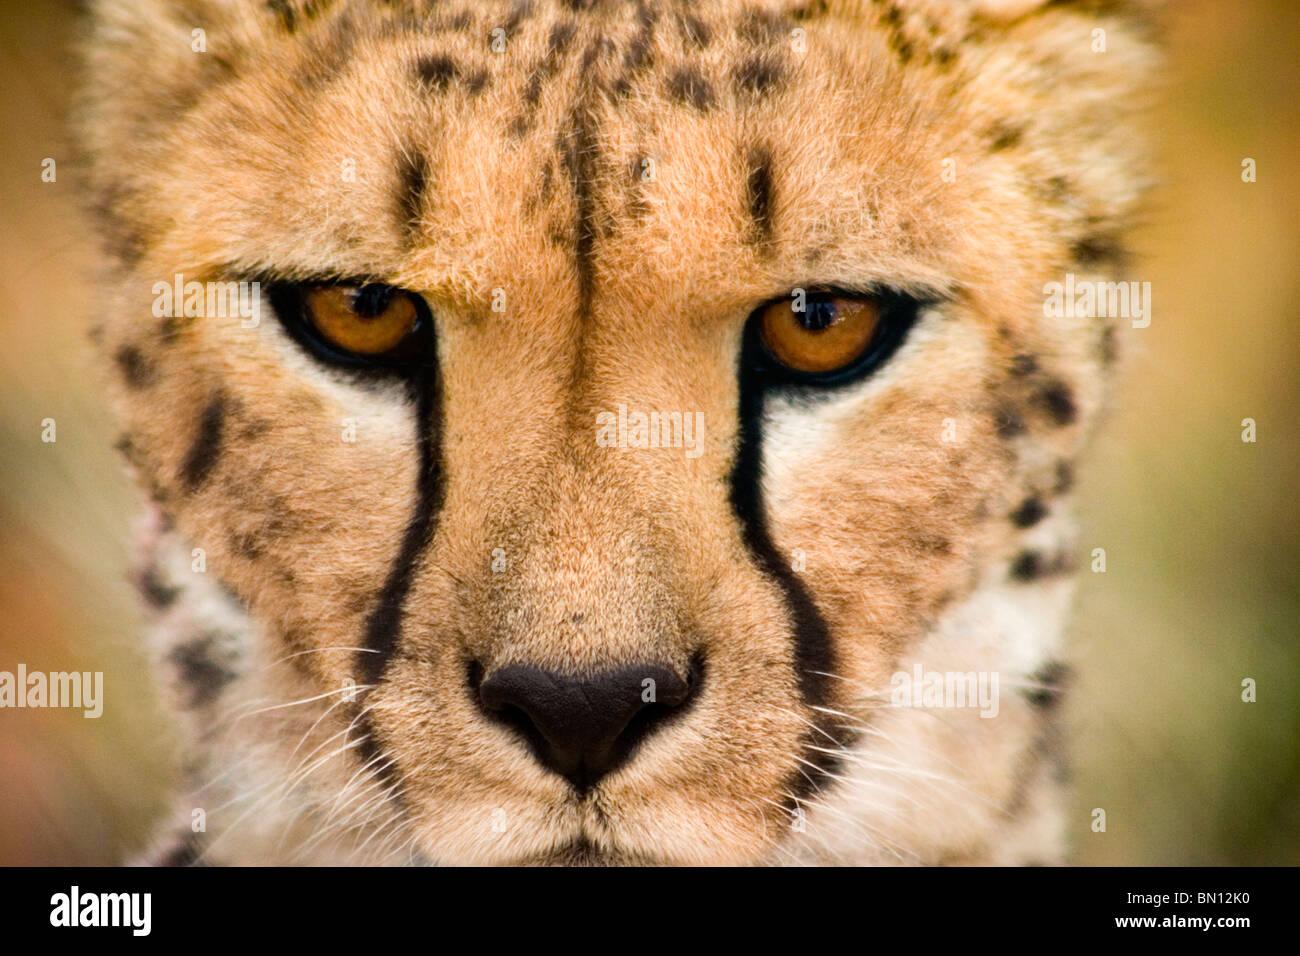 Cheetah portrait, Namibia, Africa - Stock Image